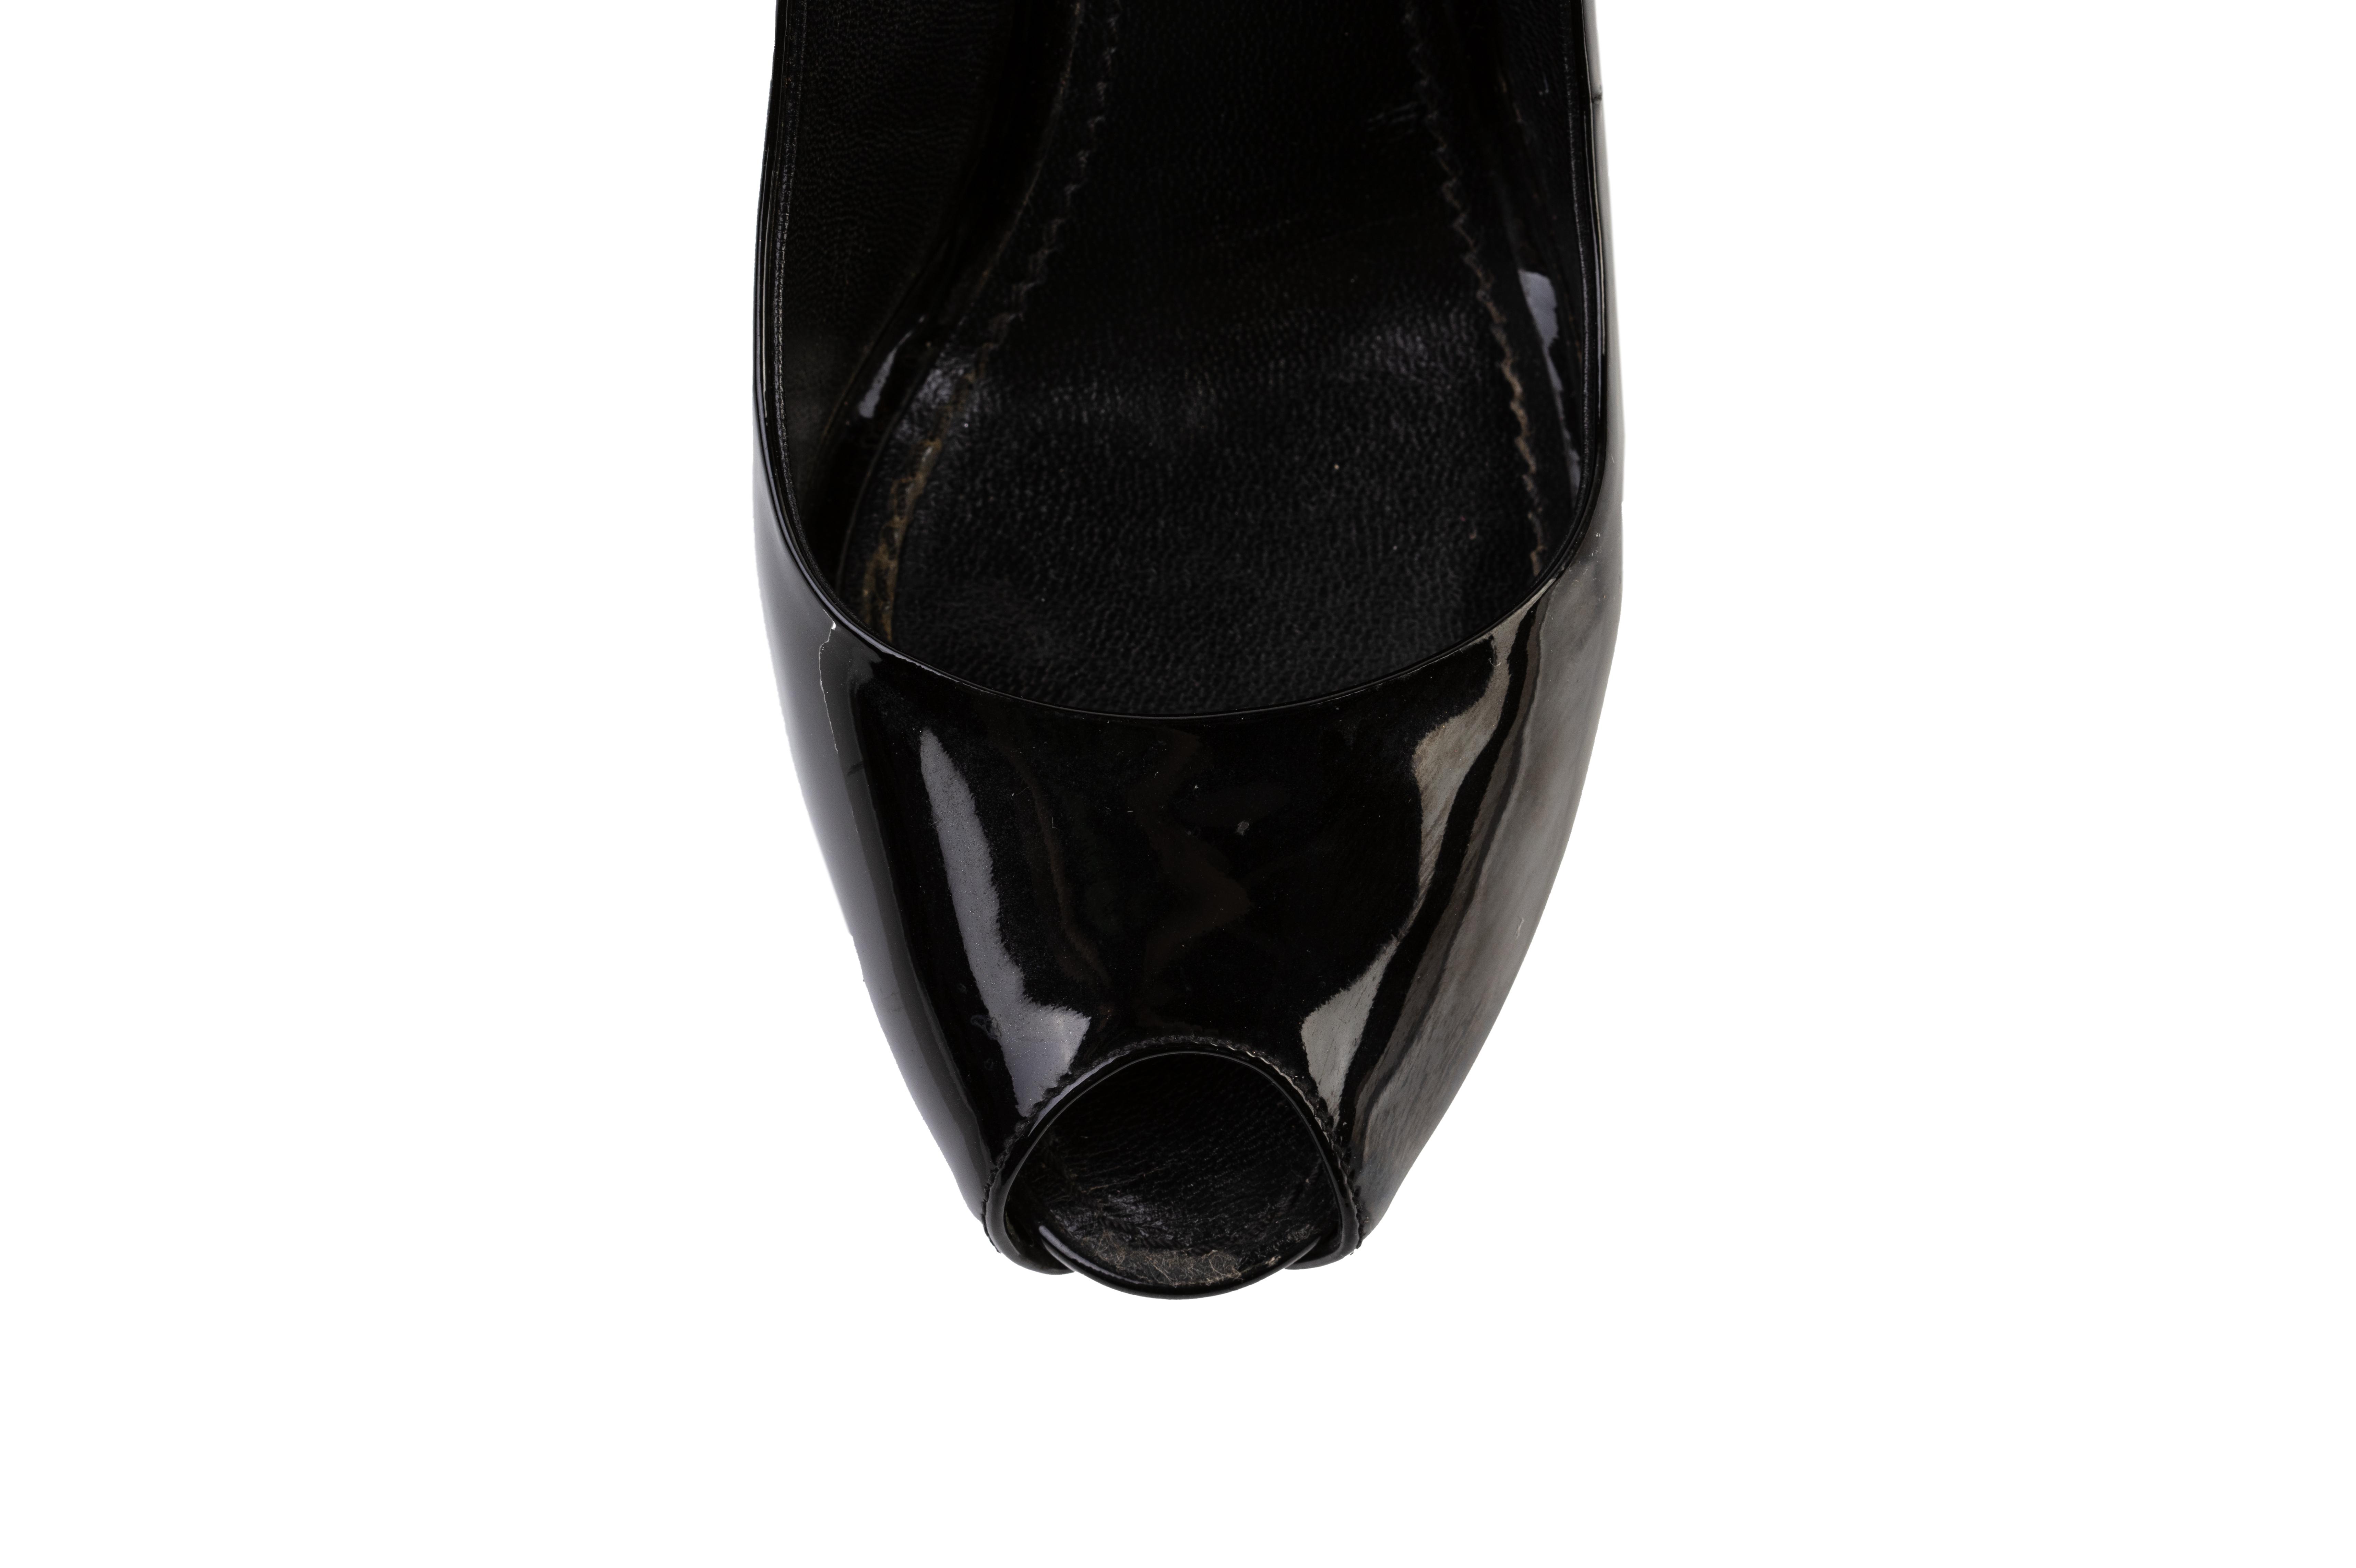 A PAIR OF LOUIS VUITTON PATENT BLACK LEATHER LOCK PUMPS EU35 - Image 4 of 7